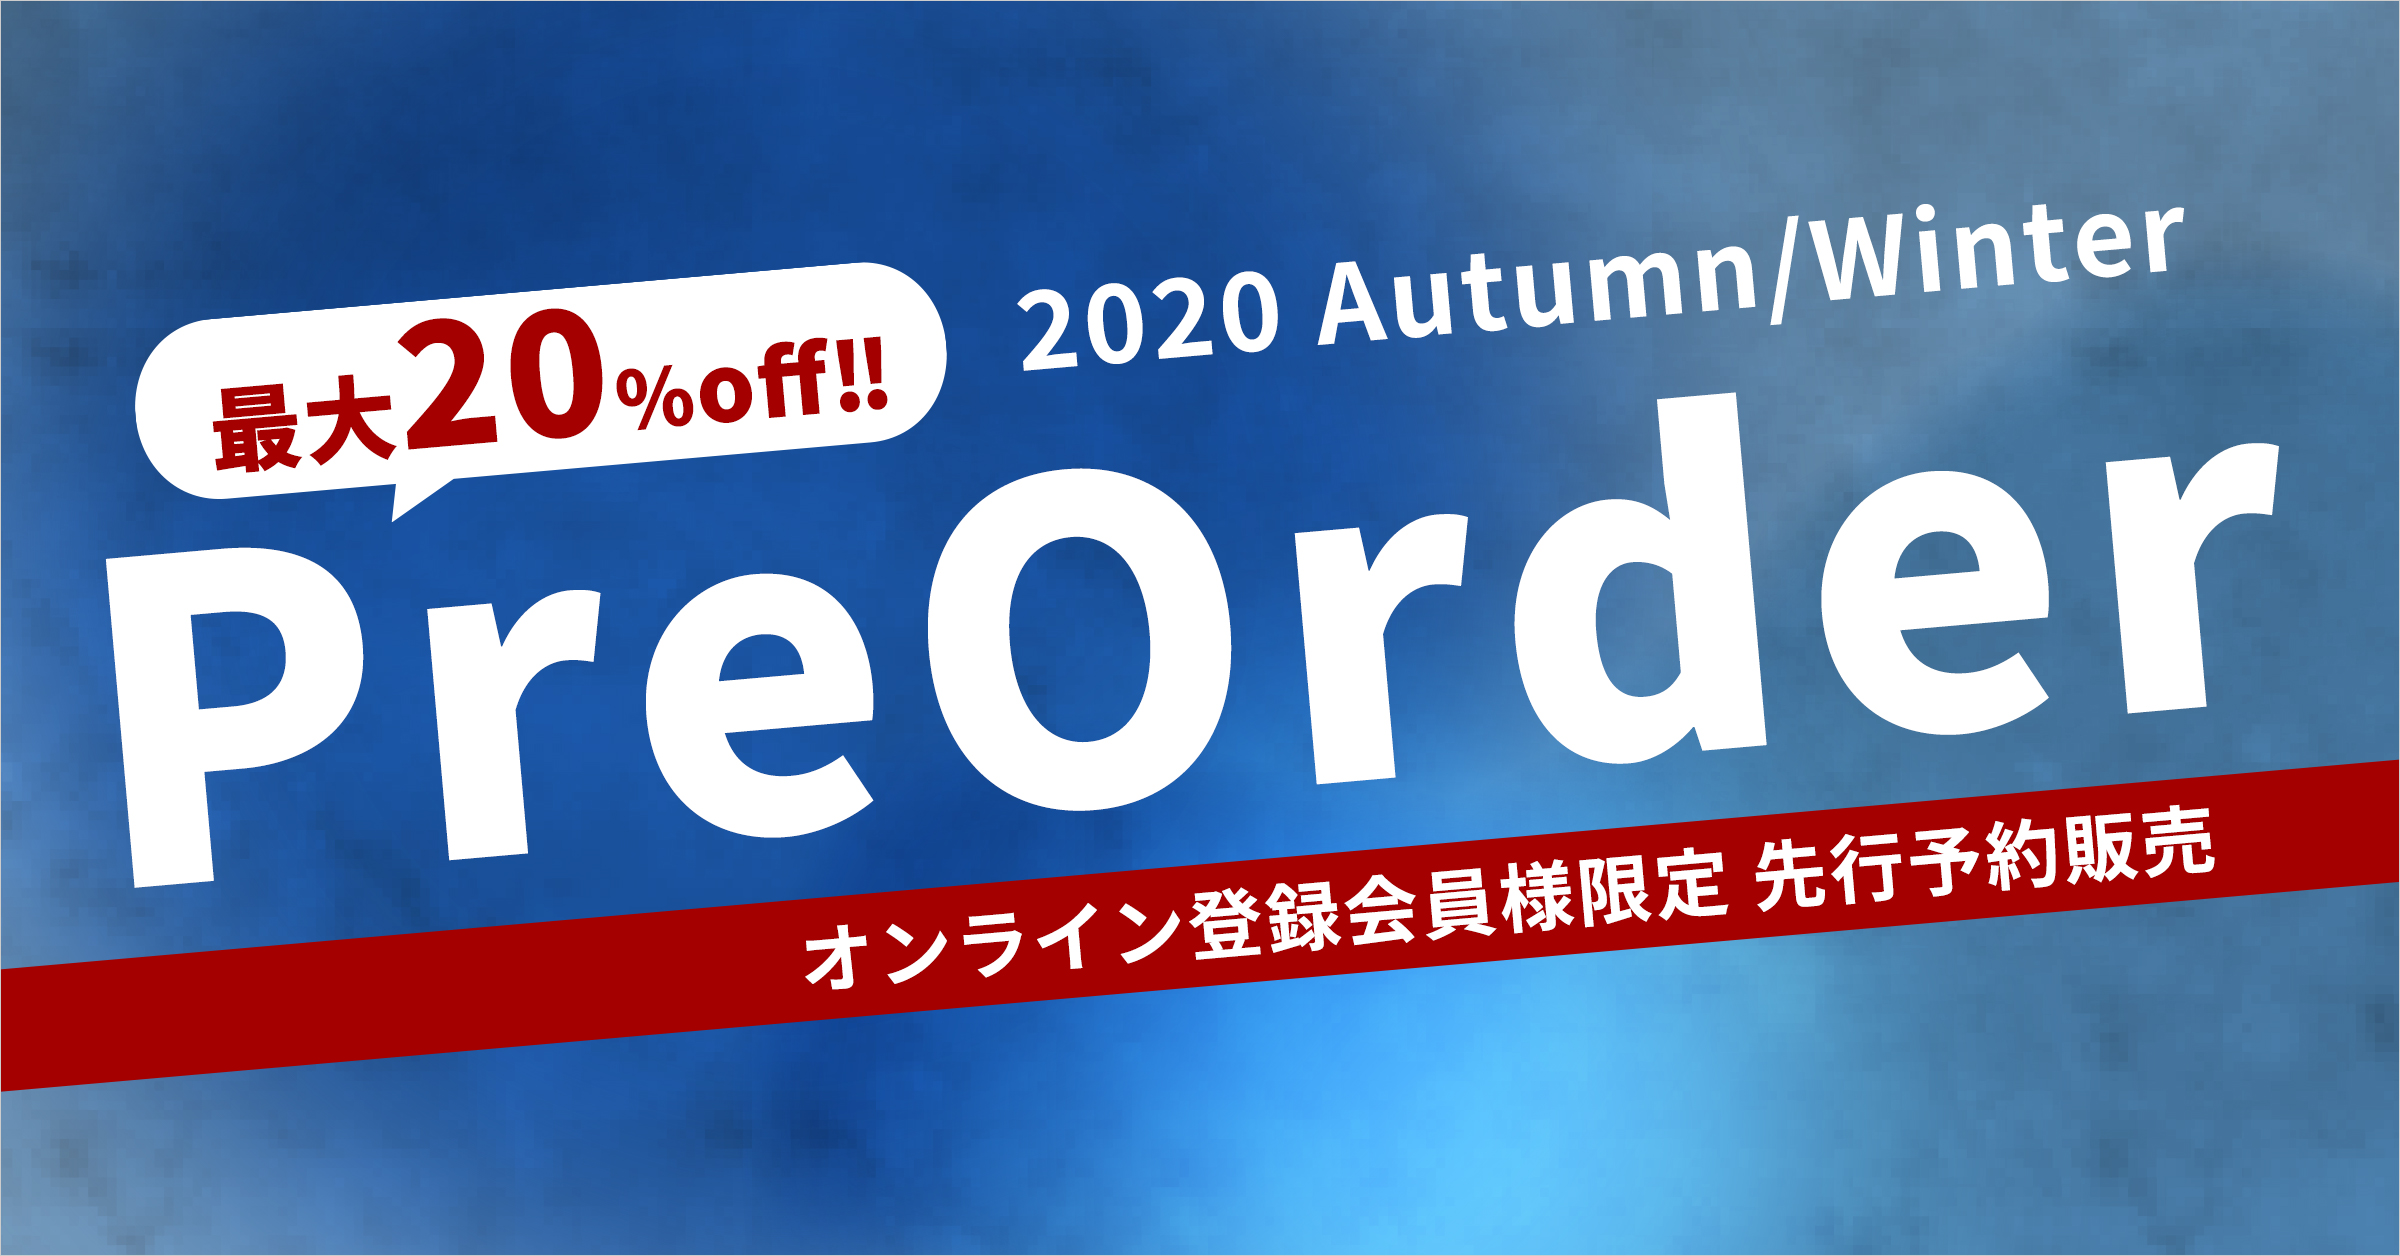 2020 Autumn/Winter プレオーダー